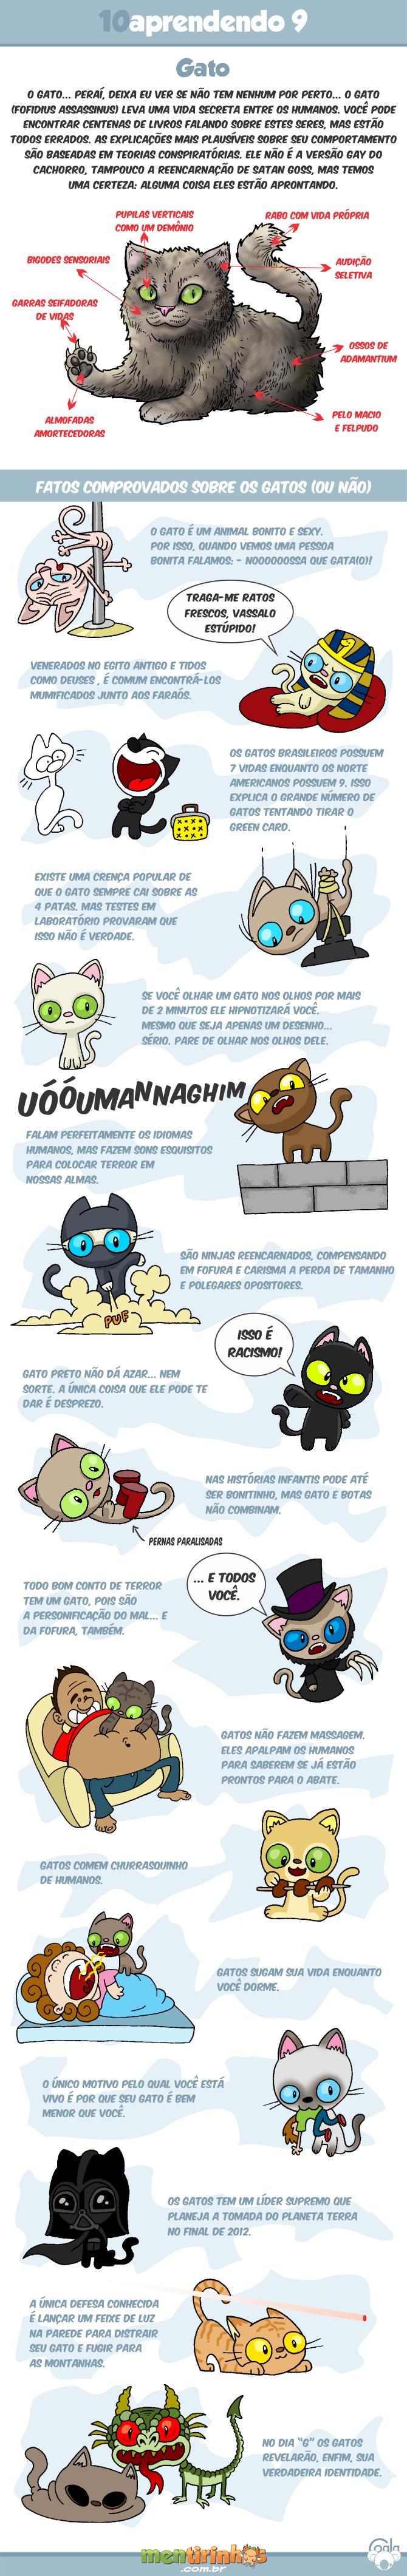 TOSKWITTER 6 TÚTIS TÚTIS TÚTIS - Página 39 10aprendendo9_gatos